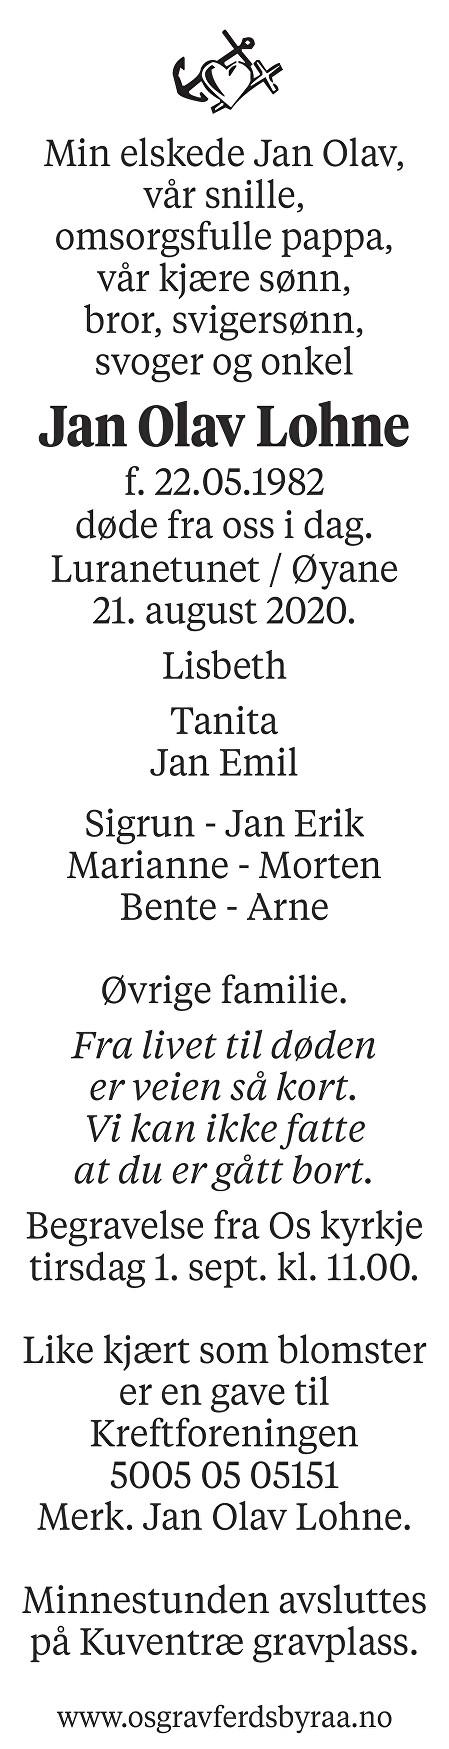 Jan Olav Lohne Dødsannonse